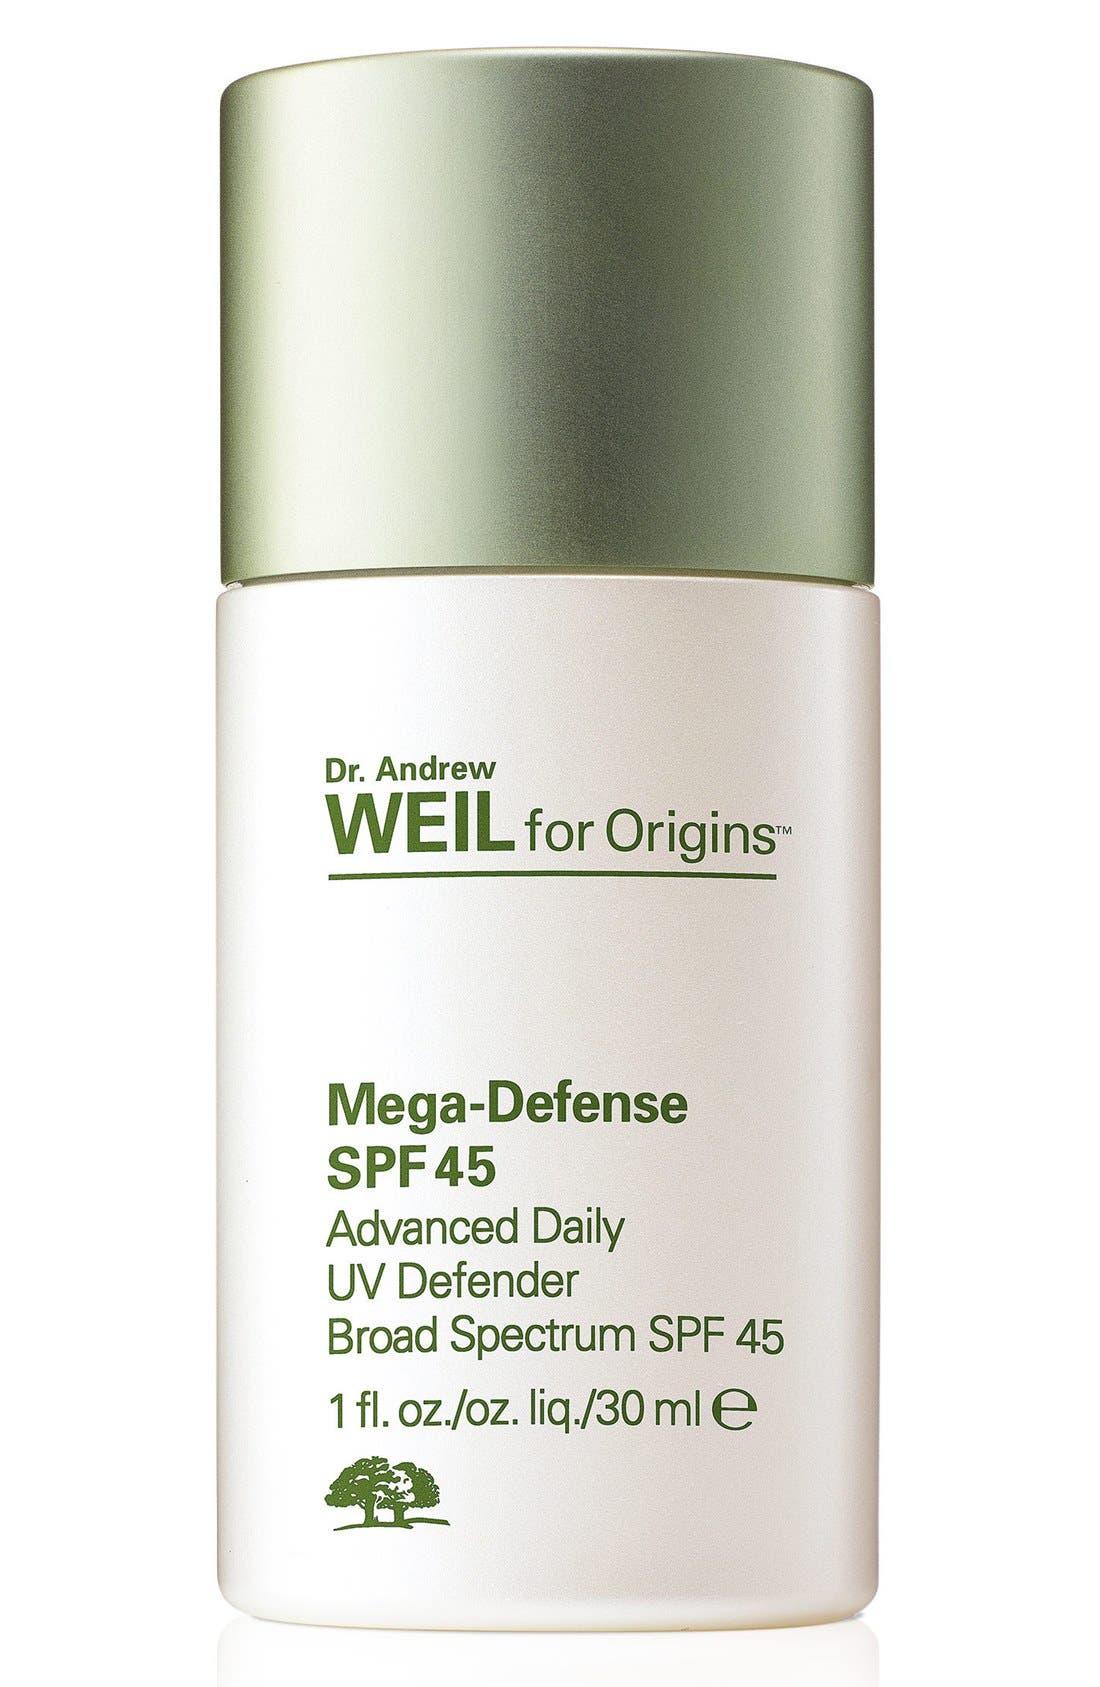 Dr. Andrew Weil for Origins<sup>™</sup> Mega-Defense Advanced Daily UV Defender SPF 45,                         Main,                         color, 000